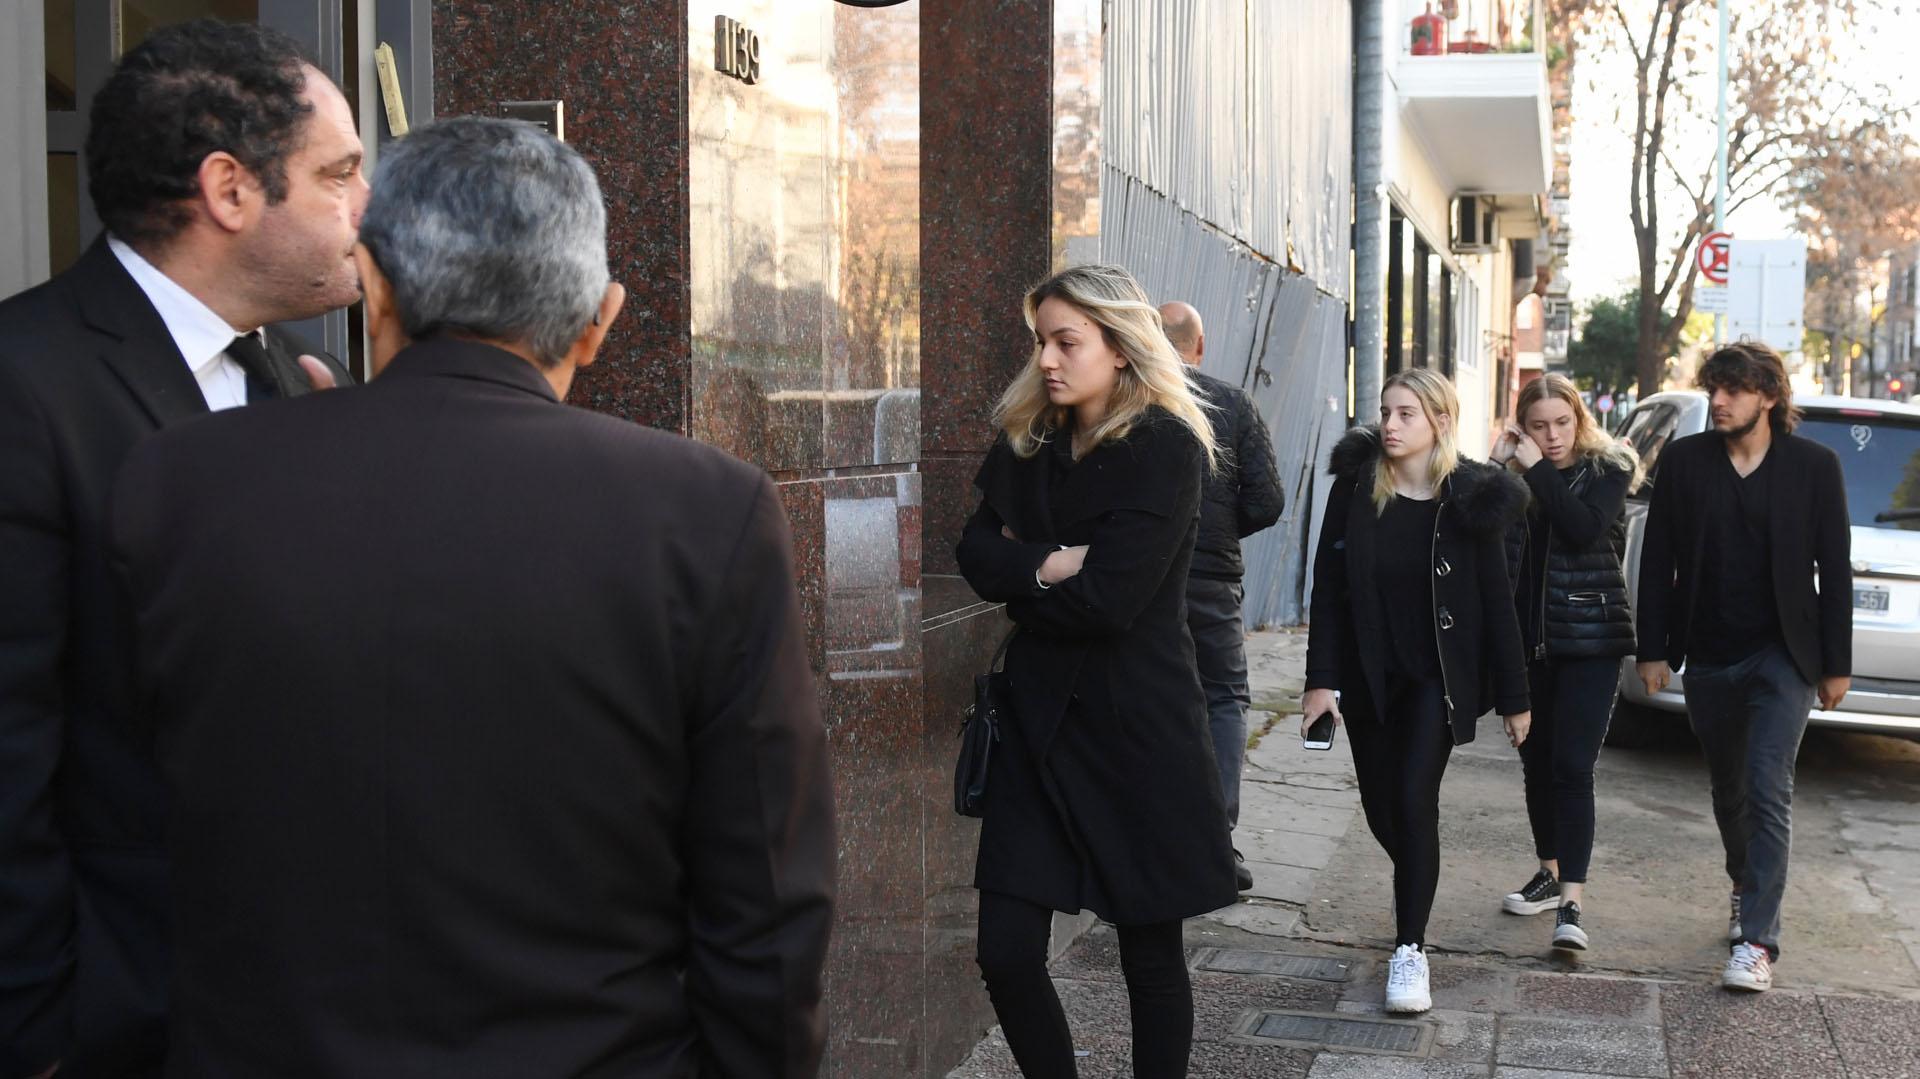 Bárbara e Ivana, las hijas mayores de Gendler